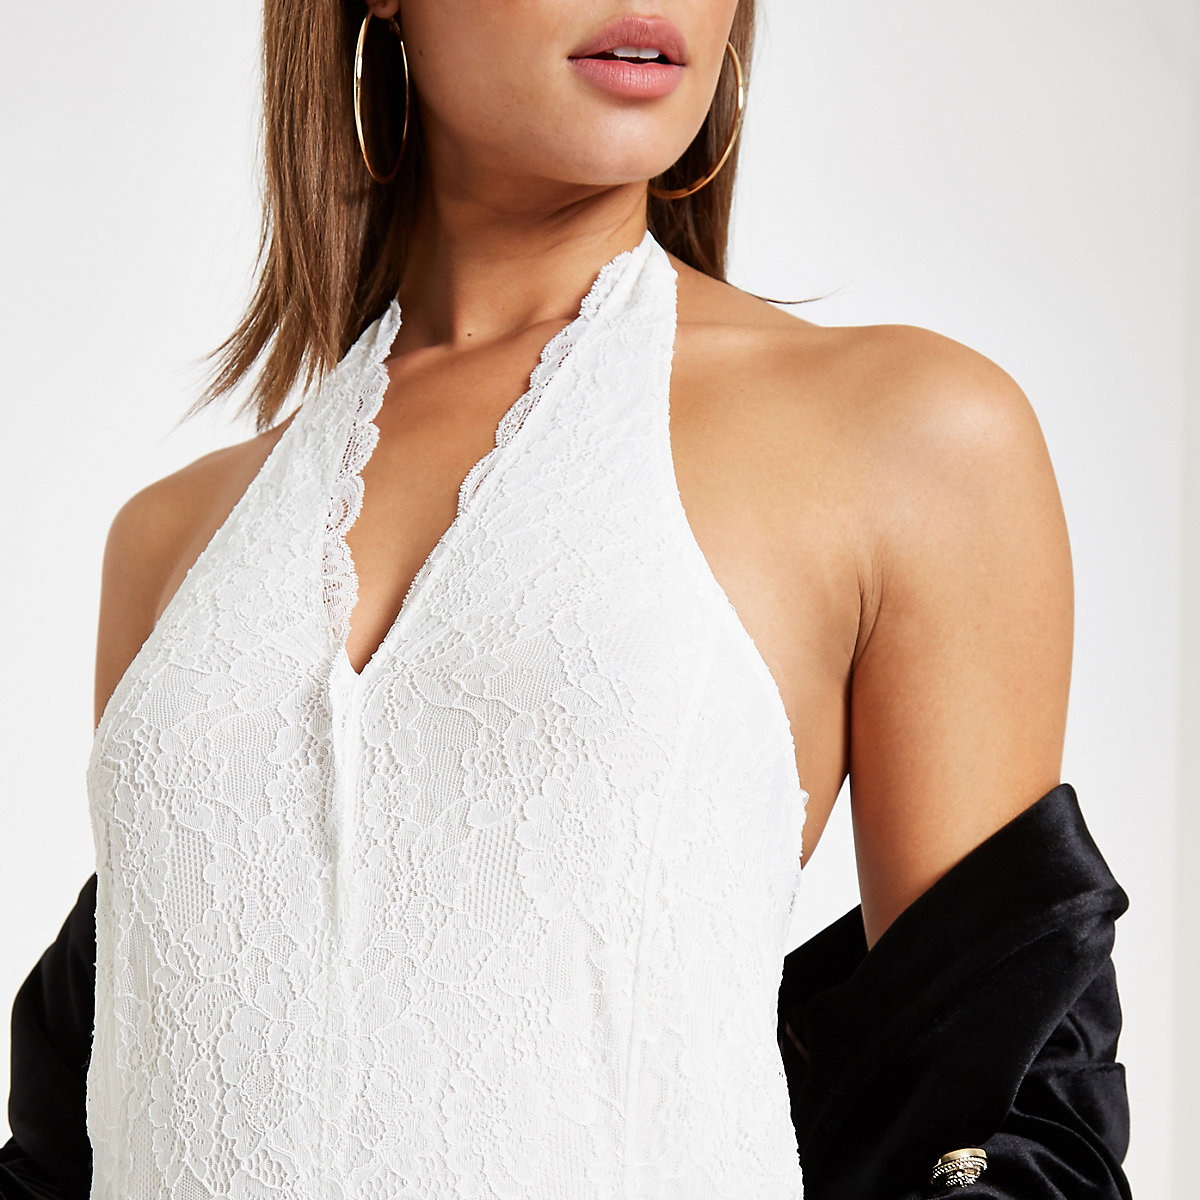 aae8a03b58 White lace halter neck bodysuit White lace halter neck bodysuit ...